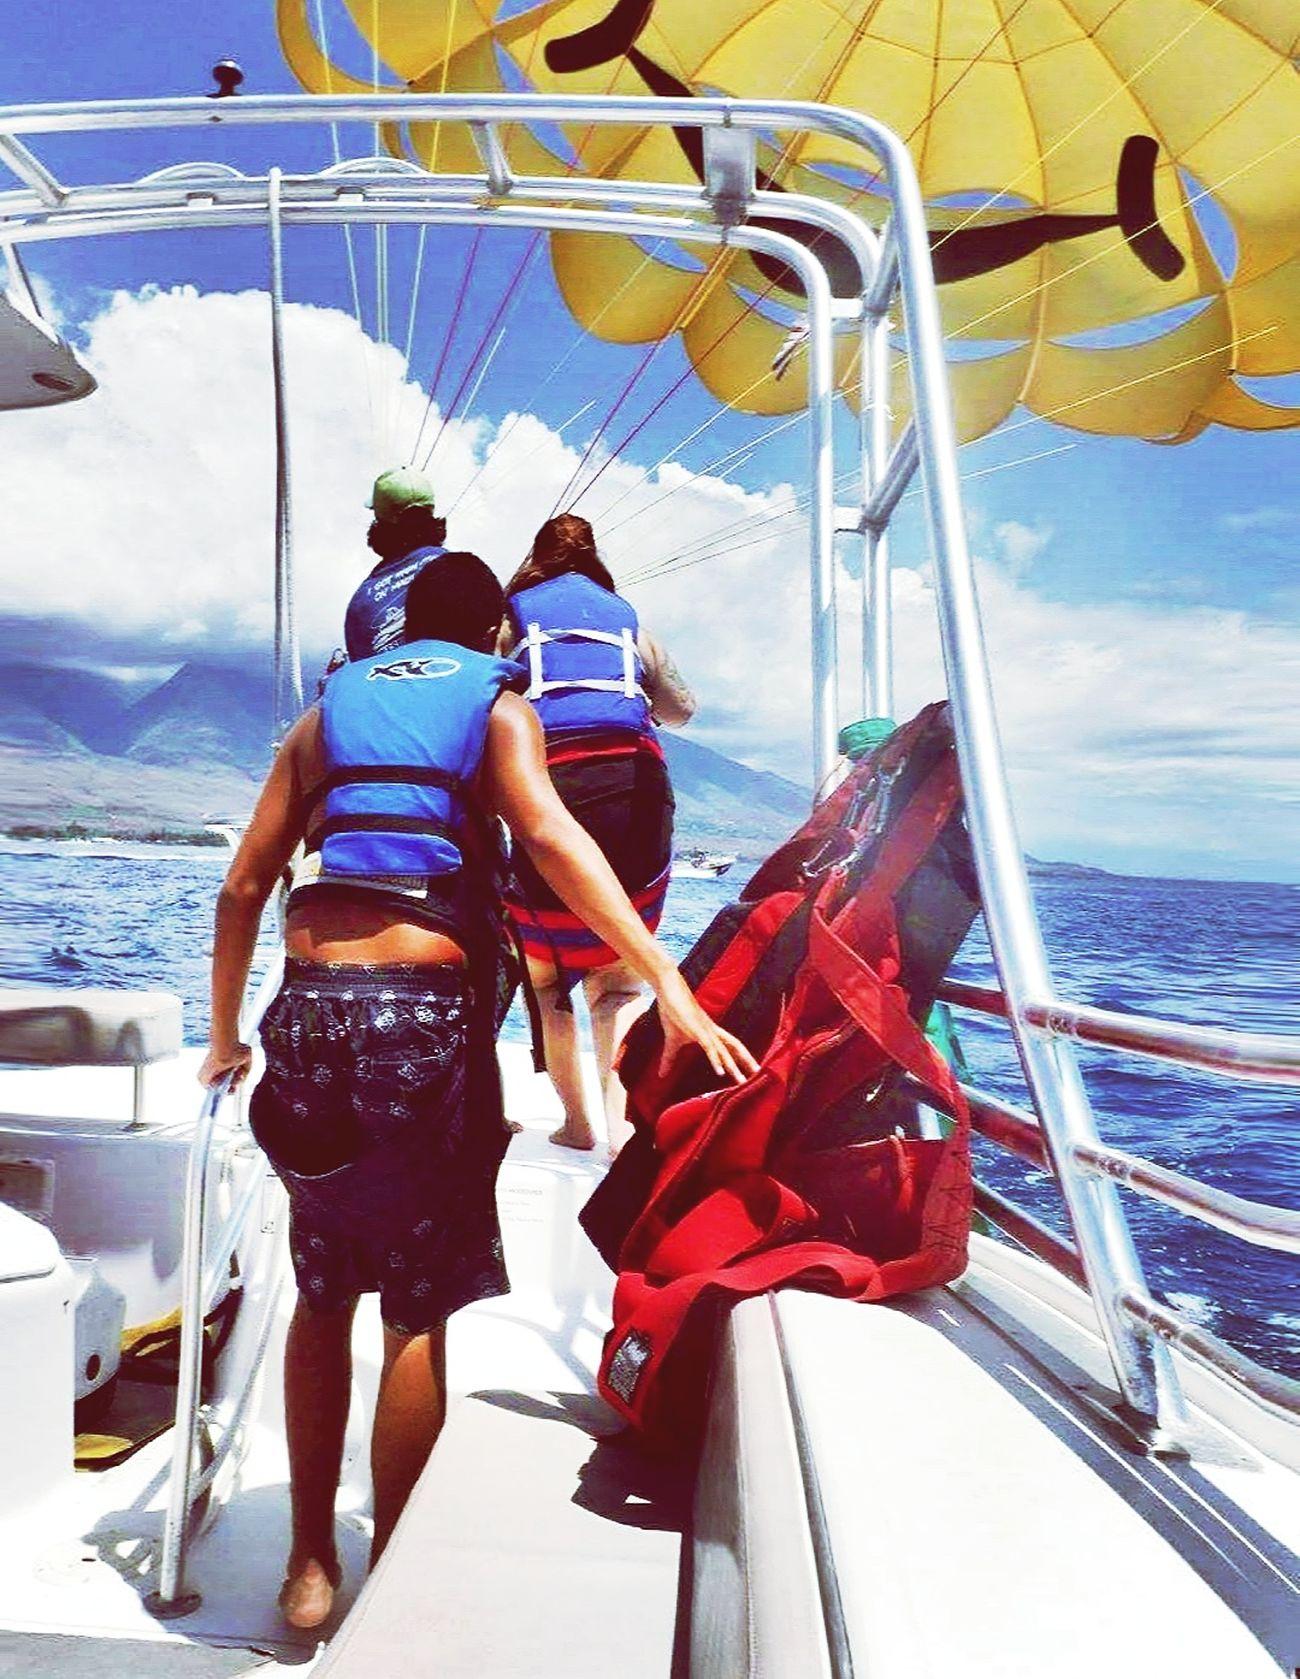 Maui Hawaii Life 808  Beach Photography Parasailing Nephew ♥ Amazing Experience